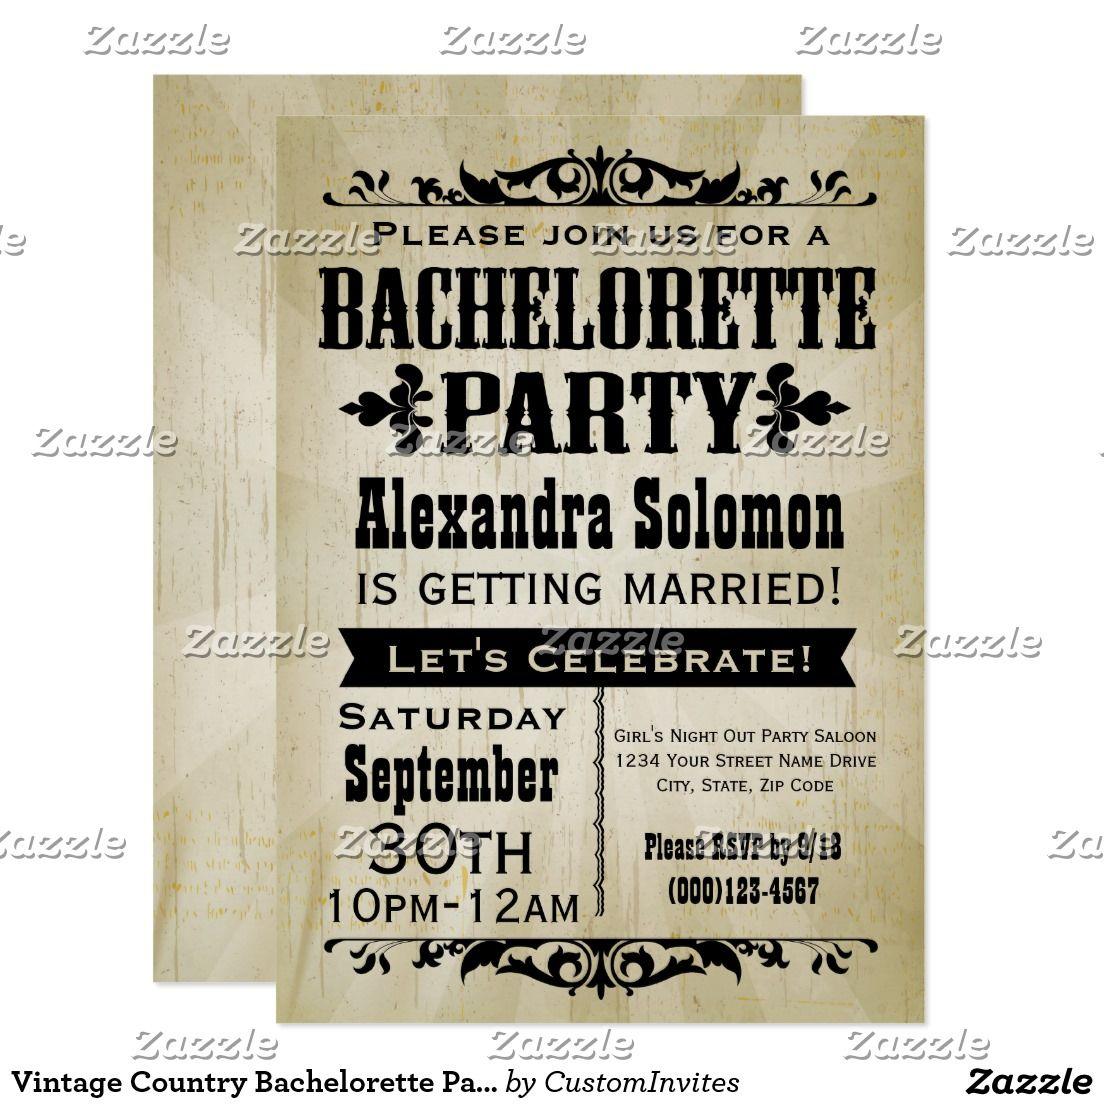 Vintage Country Bachelorette Party Invitation | Bachelorette Party ...